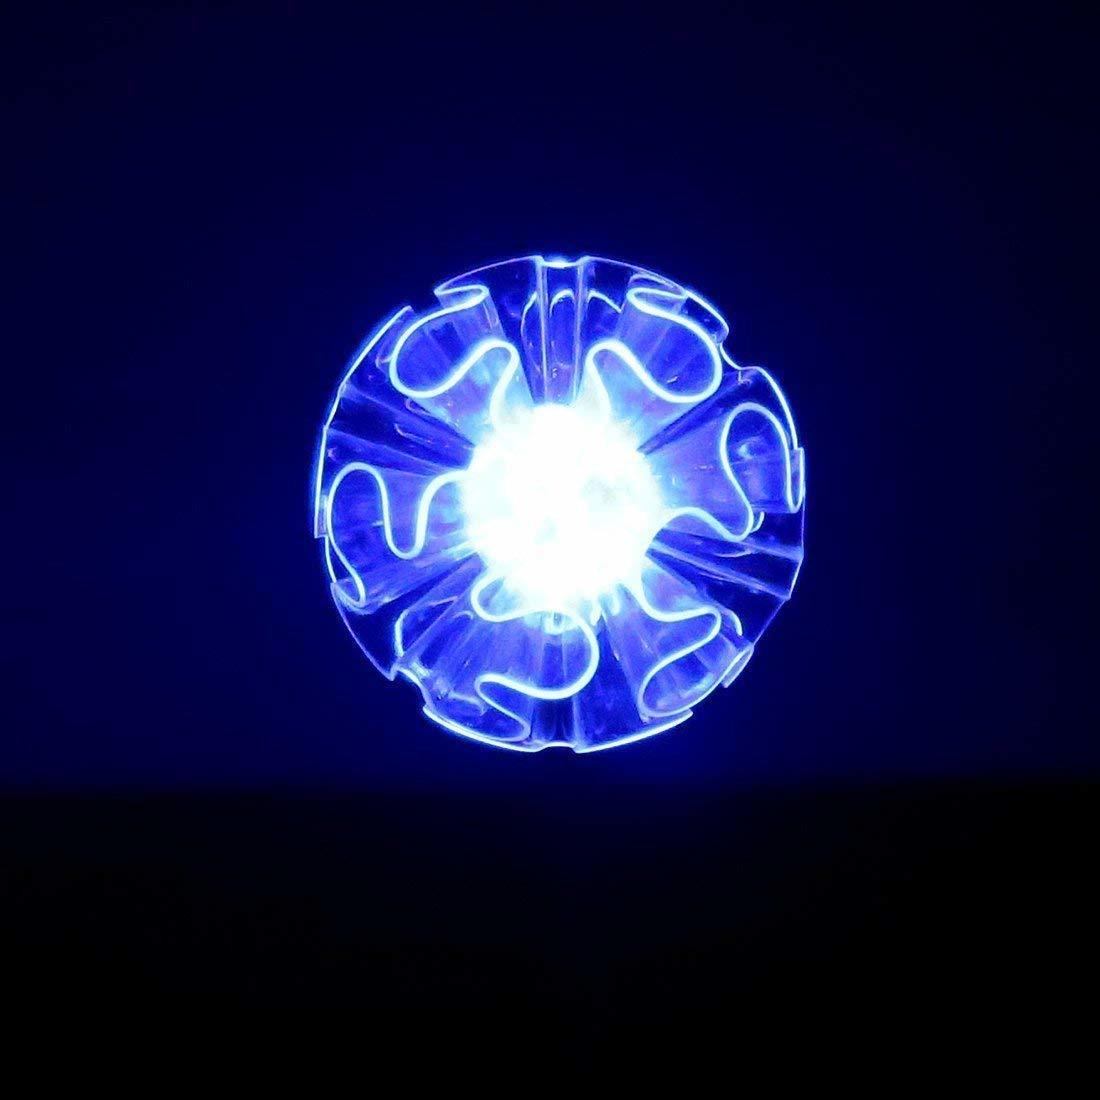 Solar Flower Decoration Stake Lights (Pack of 3)